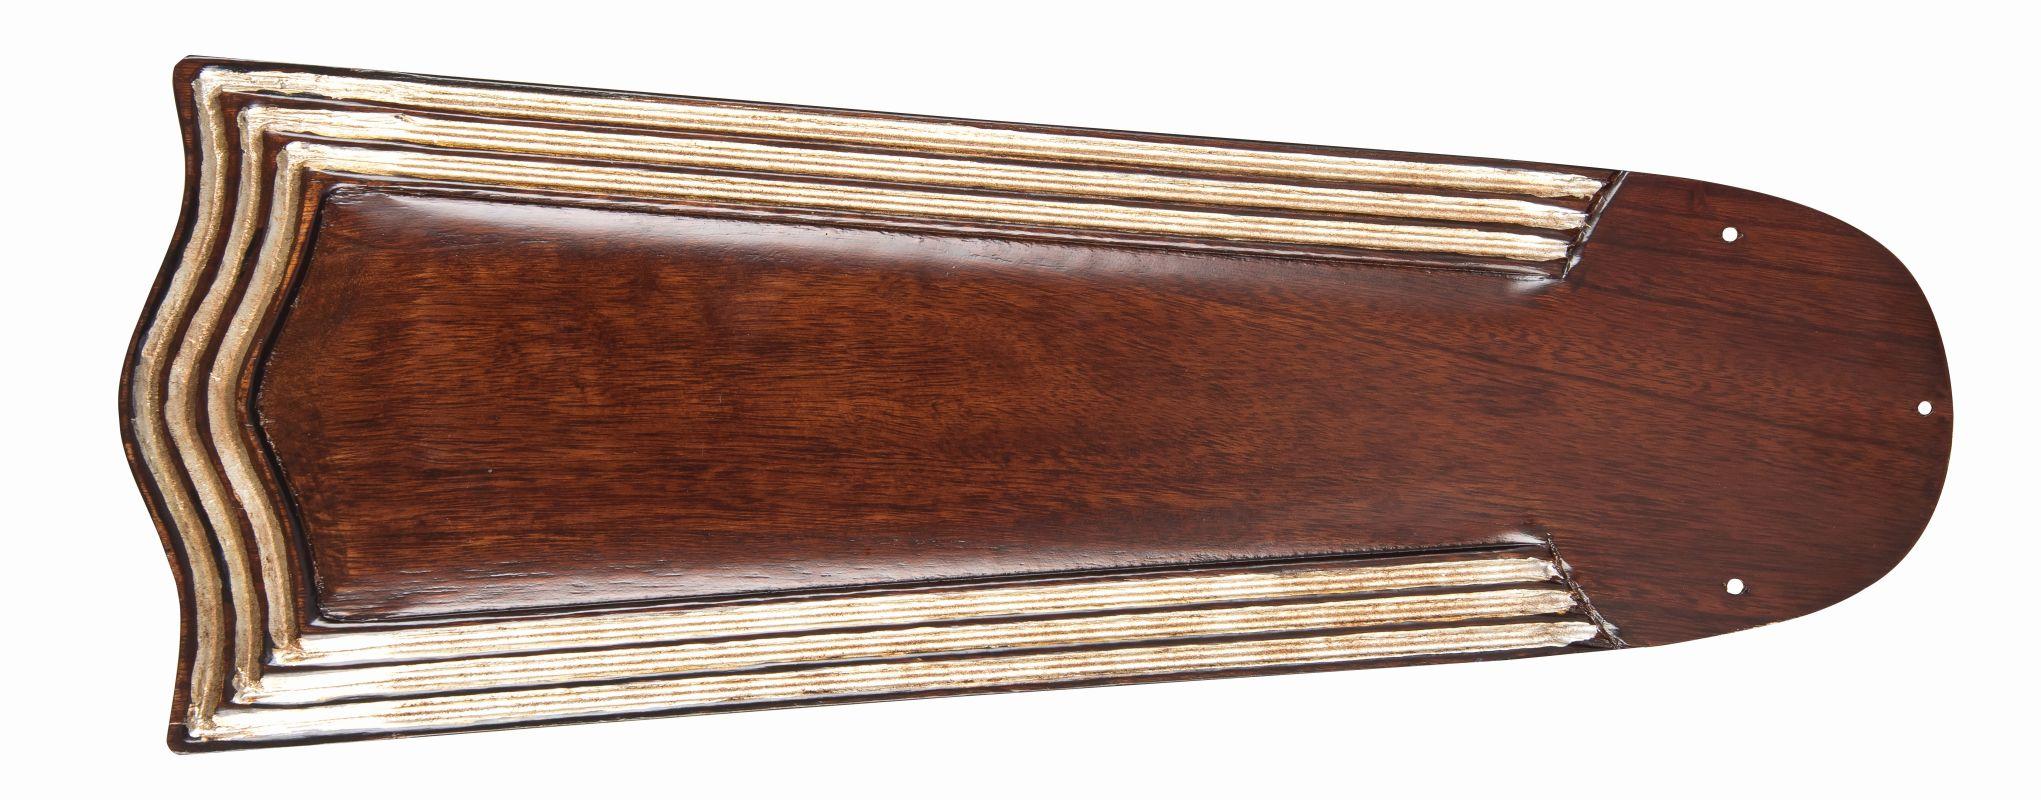 "Craftmade B556C 5 Blade Pack - 56"" Carved Blades Ebony / Vintage"